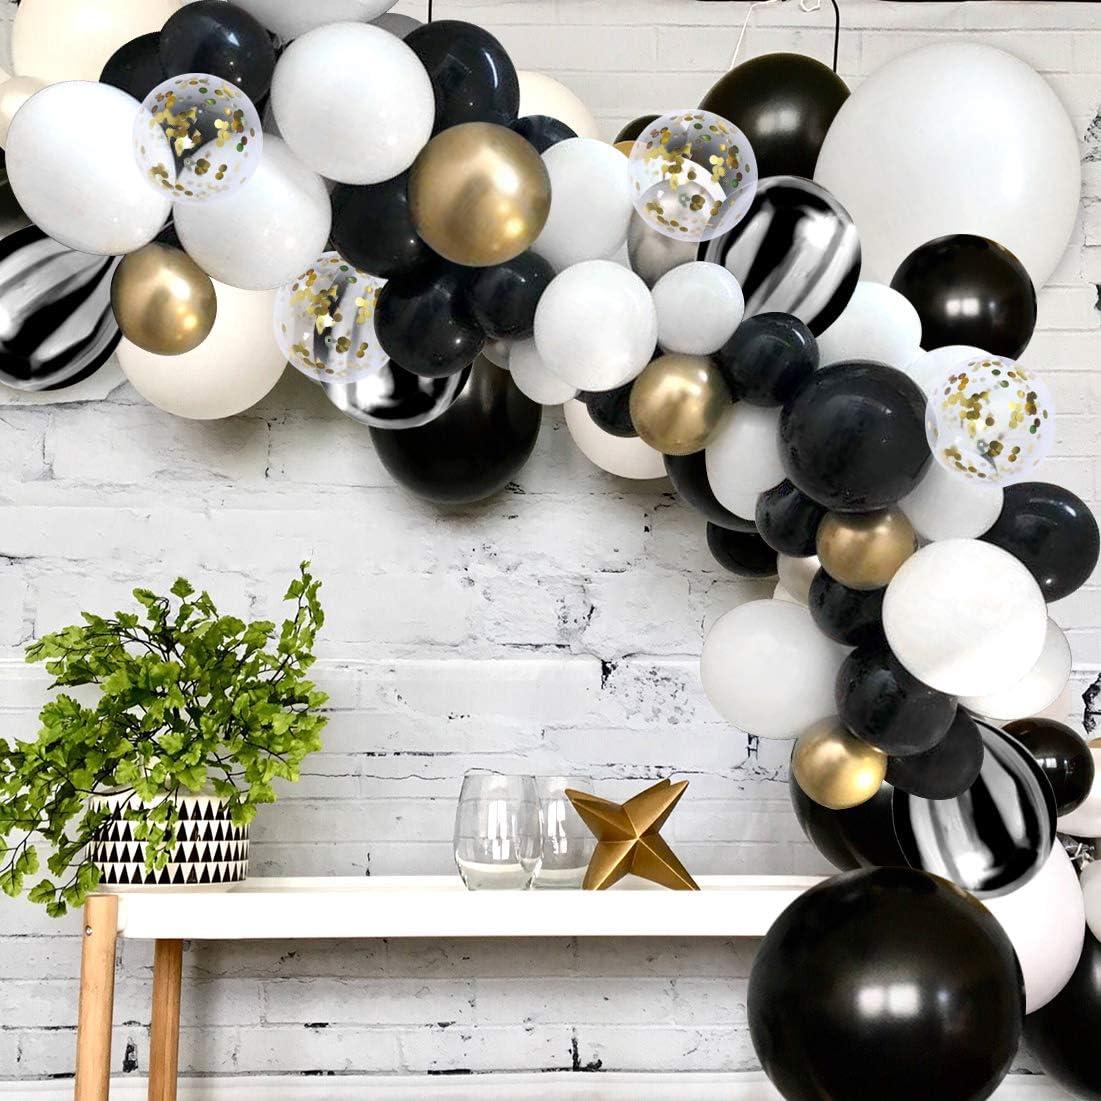 White Black Balloon Arch Kit Agate Black Bronze Gold Balloons for  Graduation Bridal Shower Birthday Party Bachelorette: Amazon.co.uk: Kitchen  & Home